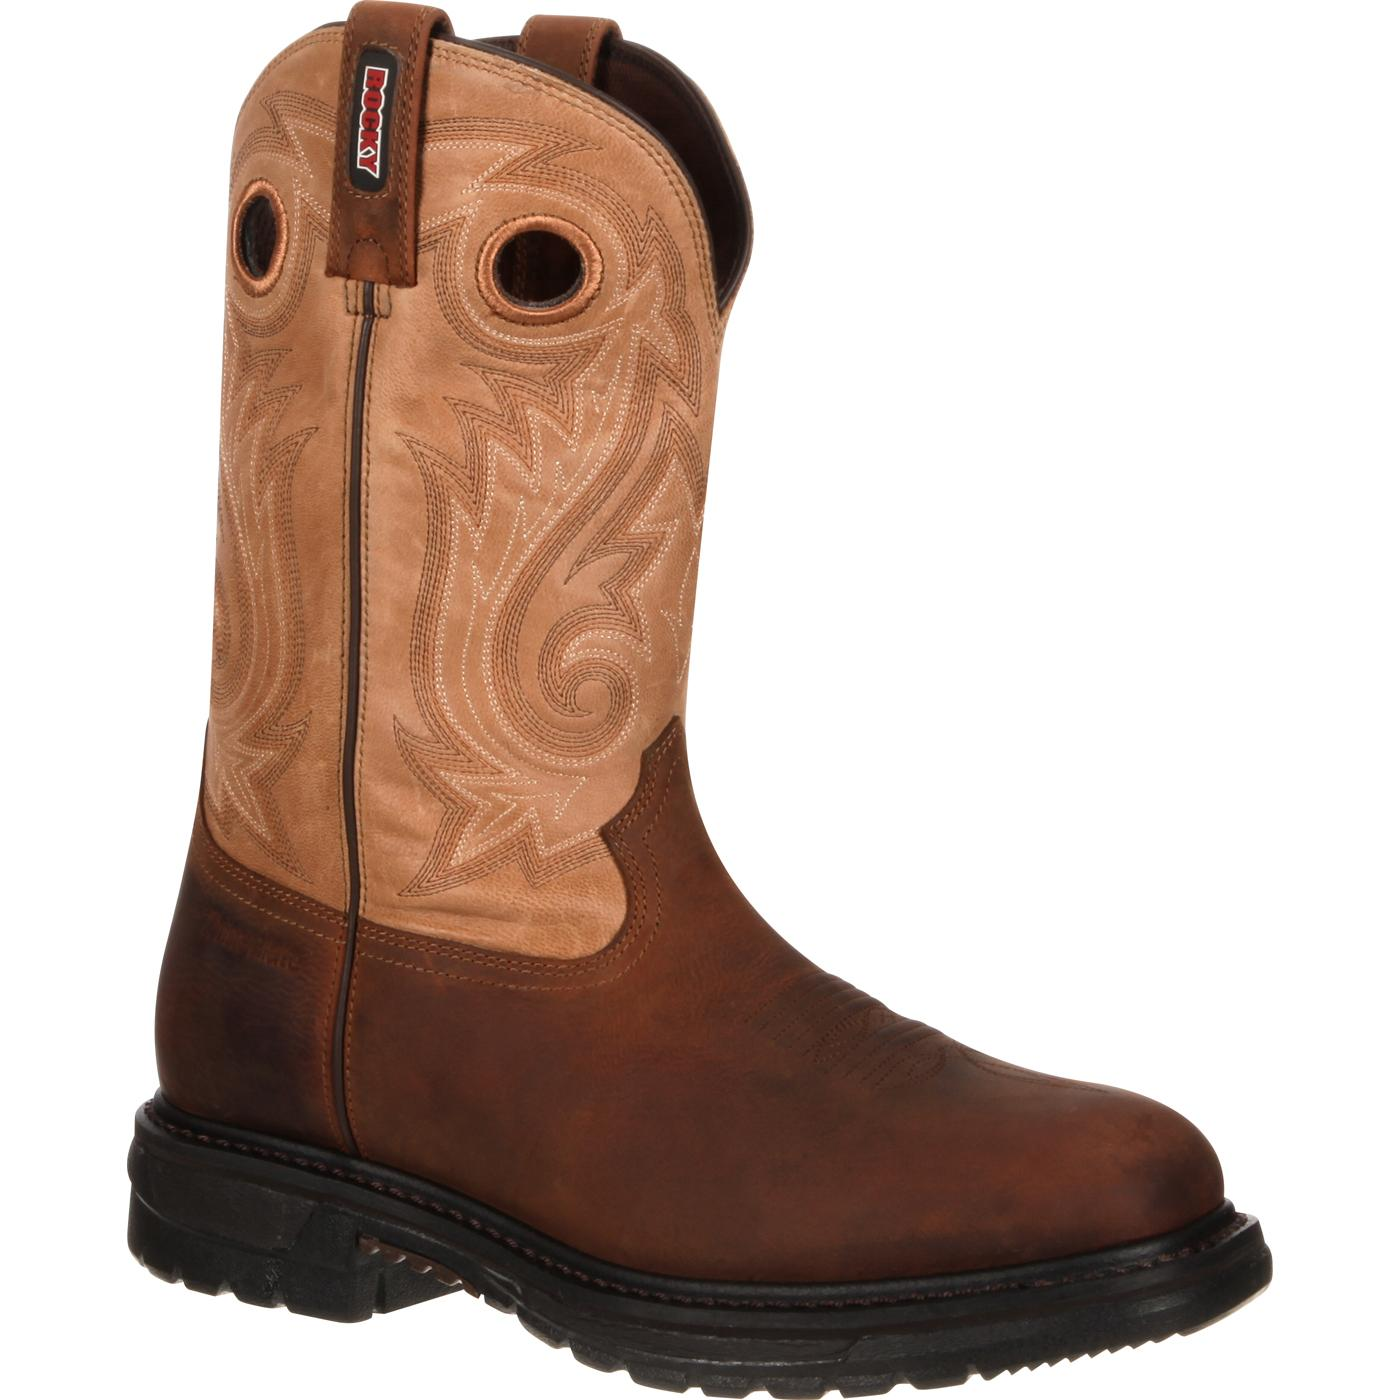 Composite Toe Waterproof Insulated Western Work Boot Rocky